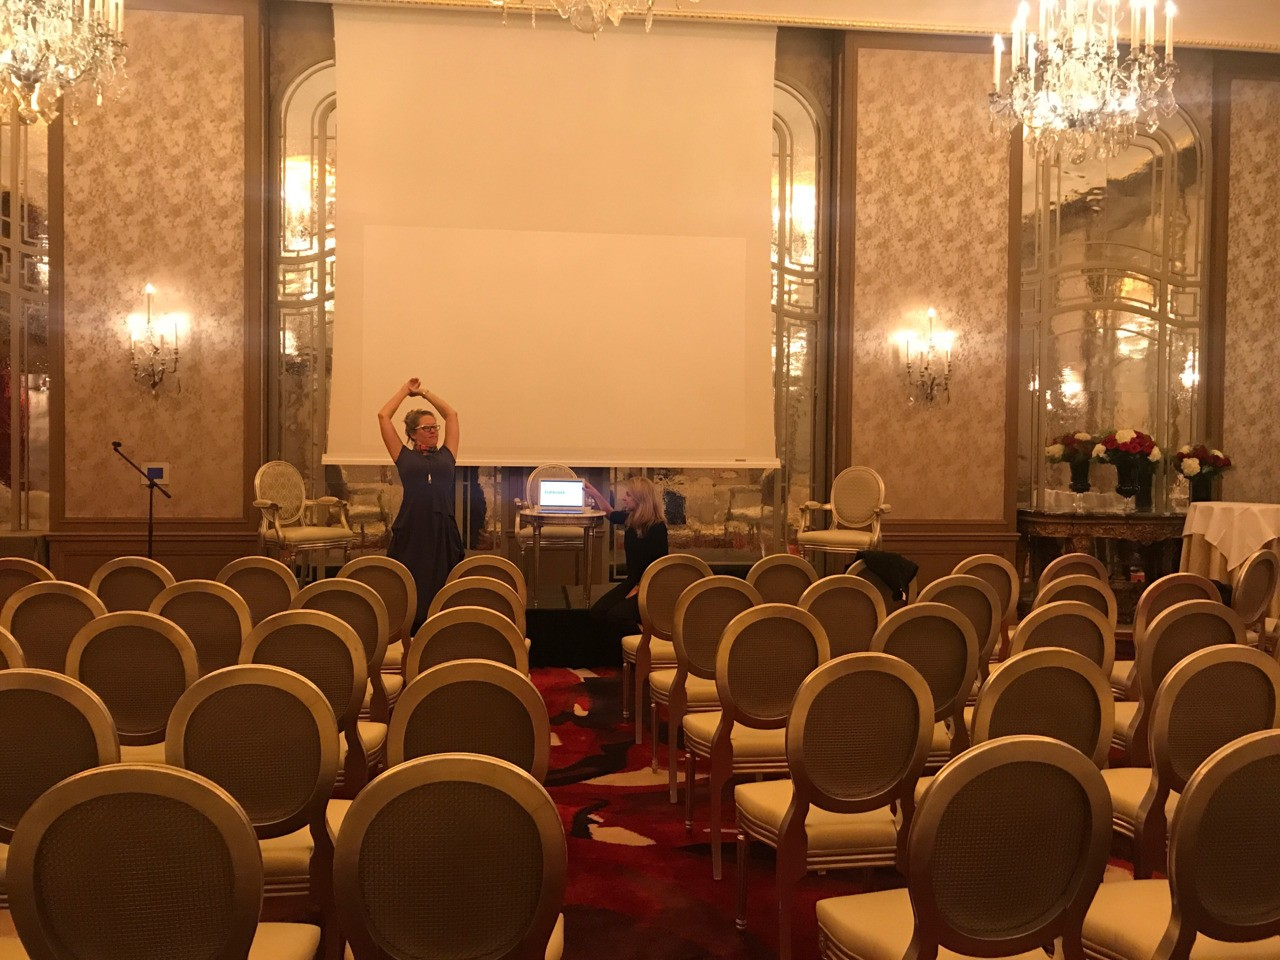 Paris event prep. Amie putting Christine thru her paces ahead of our event in Paris tomorrow.!🇫🇷